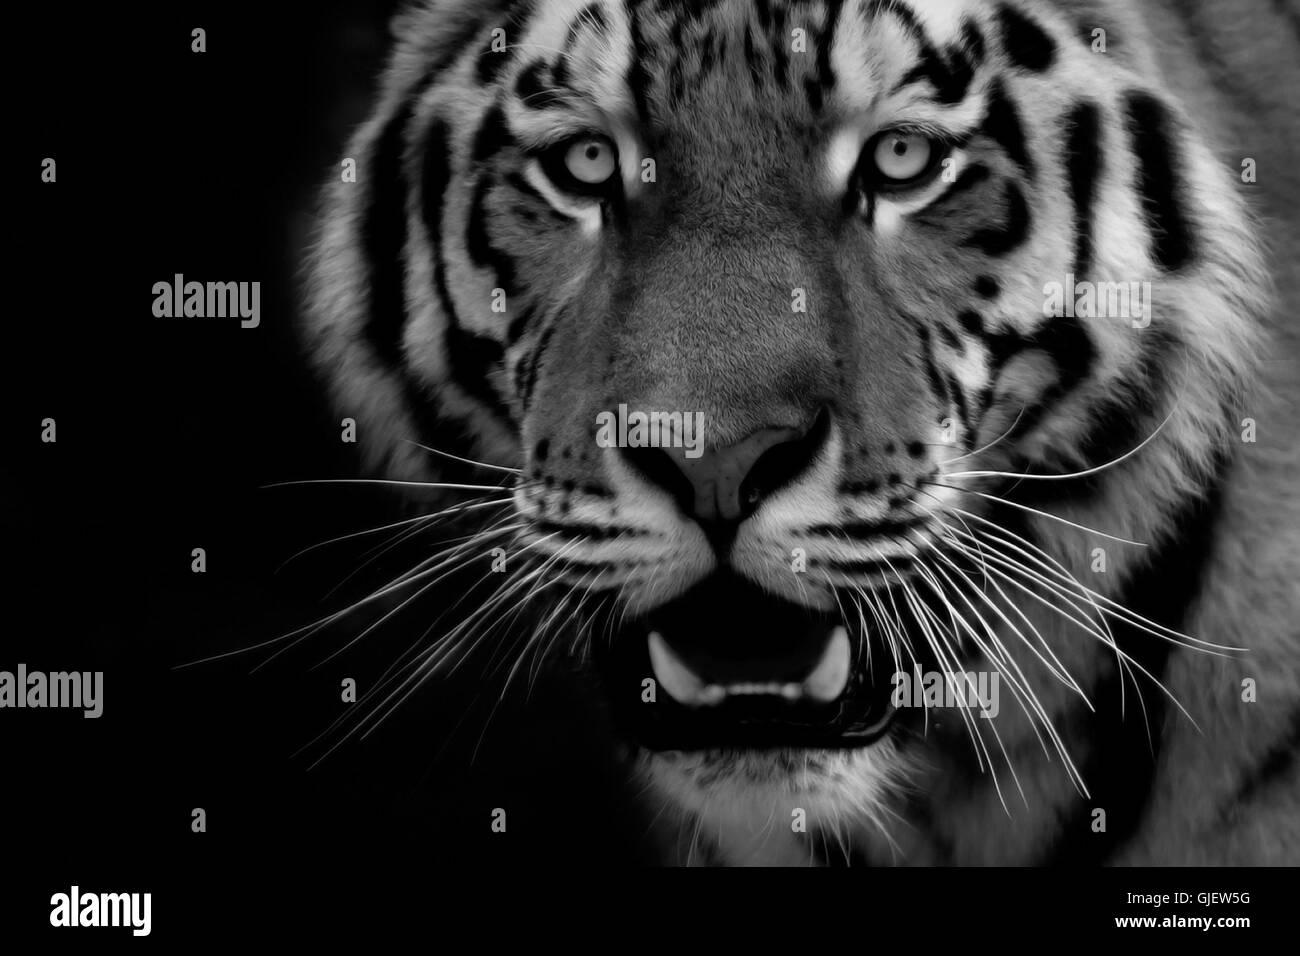 tiger portrait 1 - Stock Image